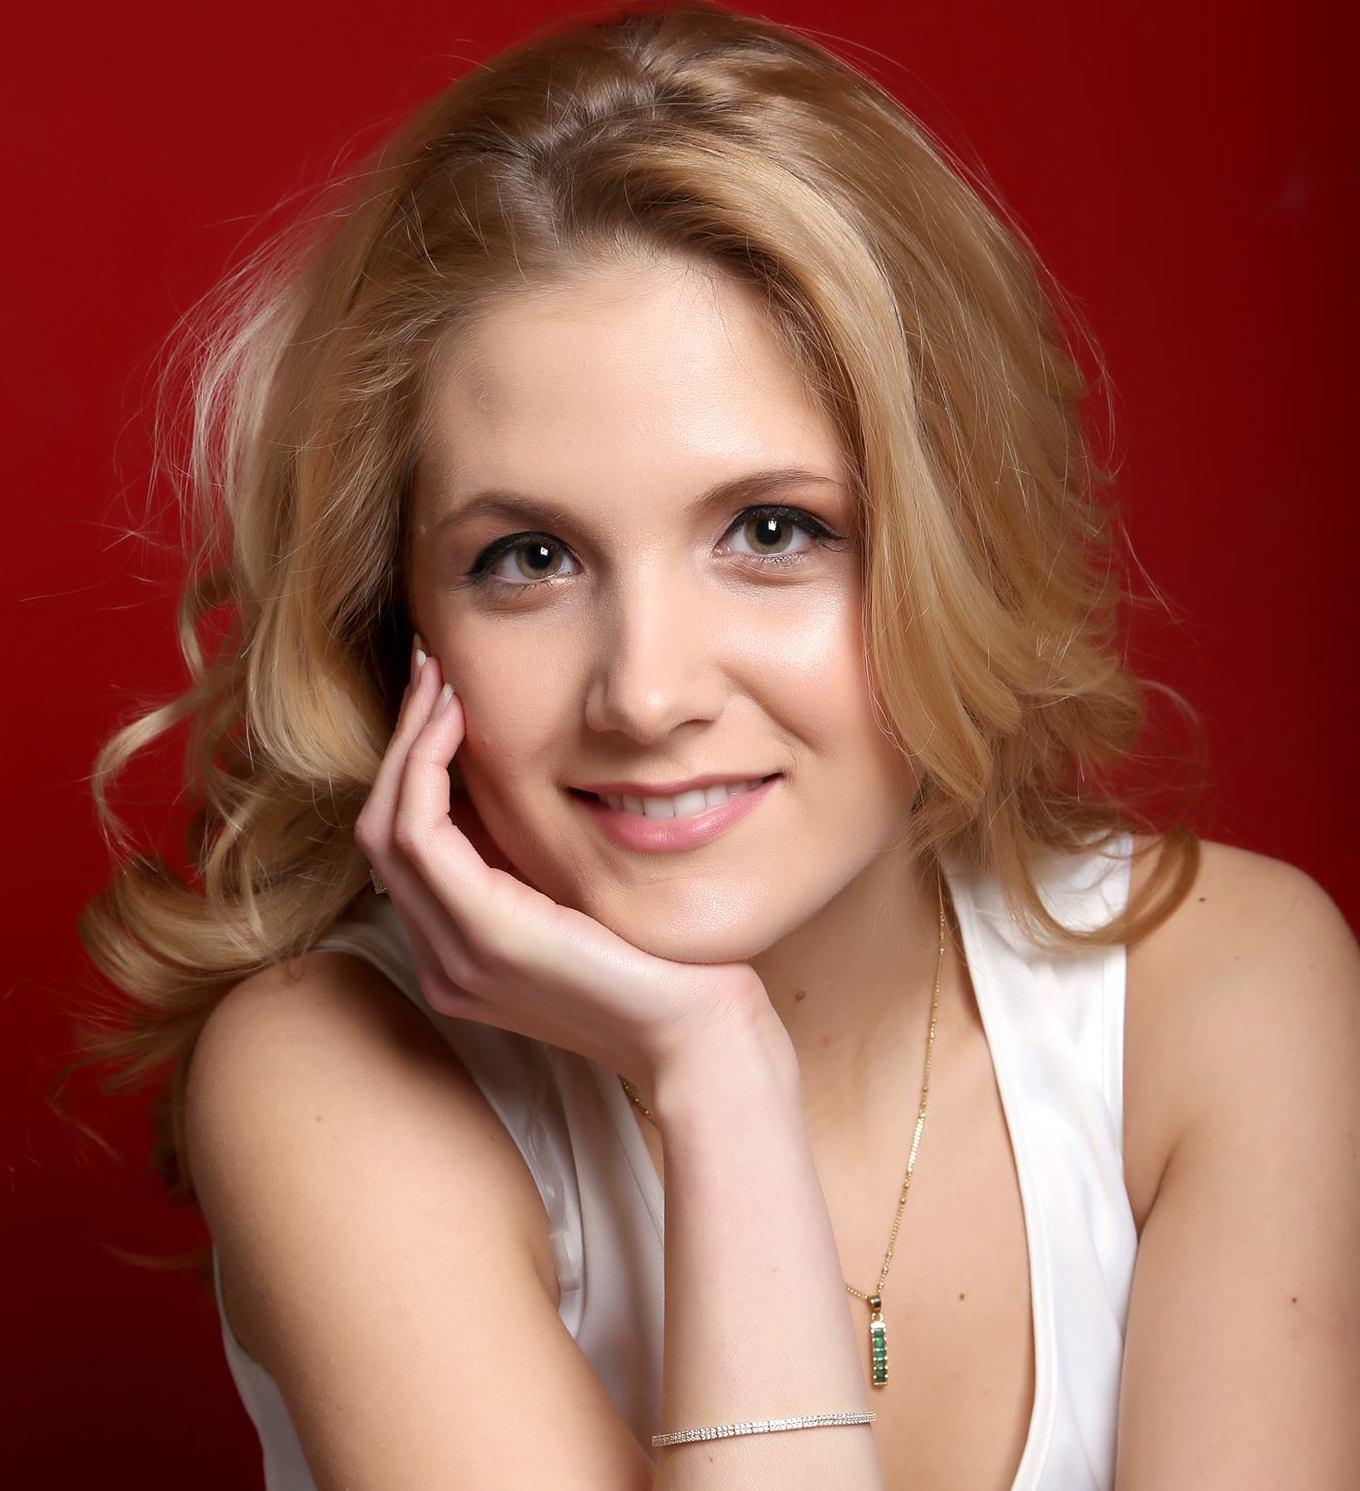 Diana Florescu